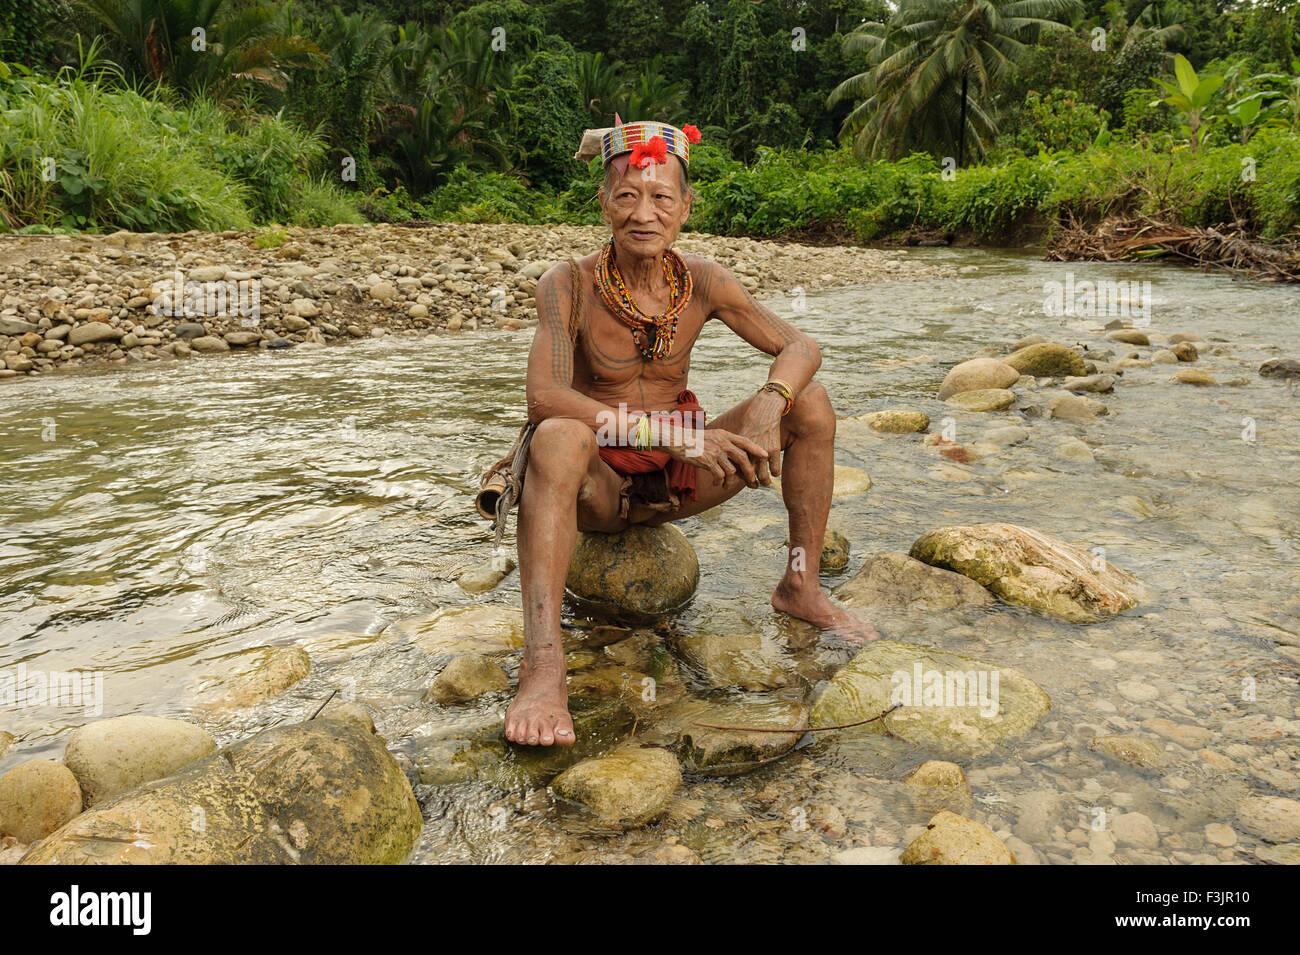 Gobbaik Toikod, 65, The indigenous inhabitants ethnic of the islands in Muara Siberut. - Stock Image